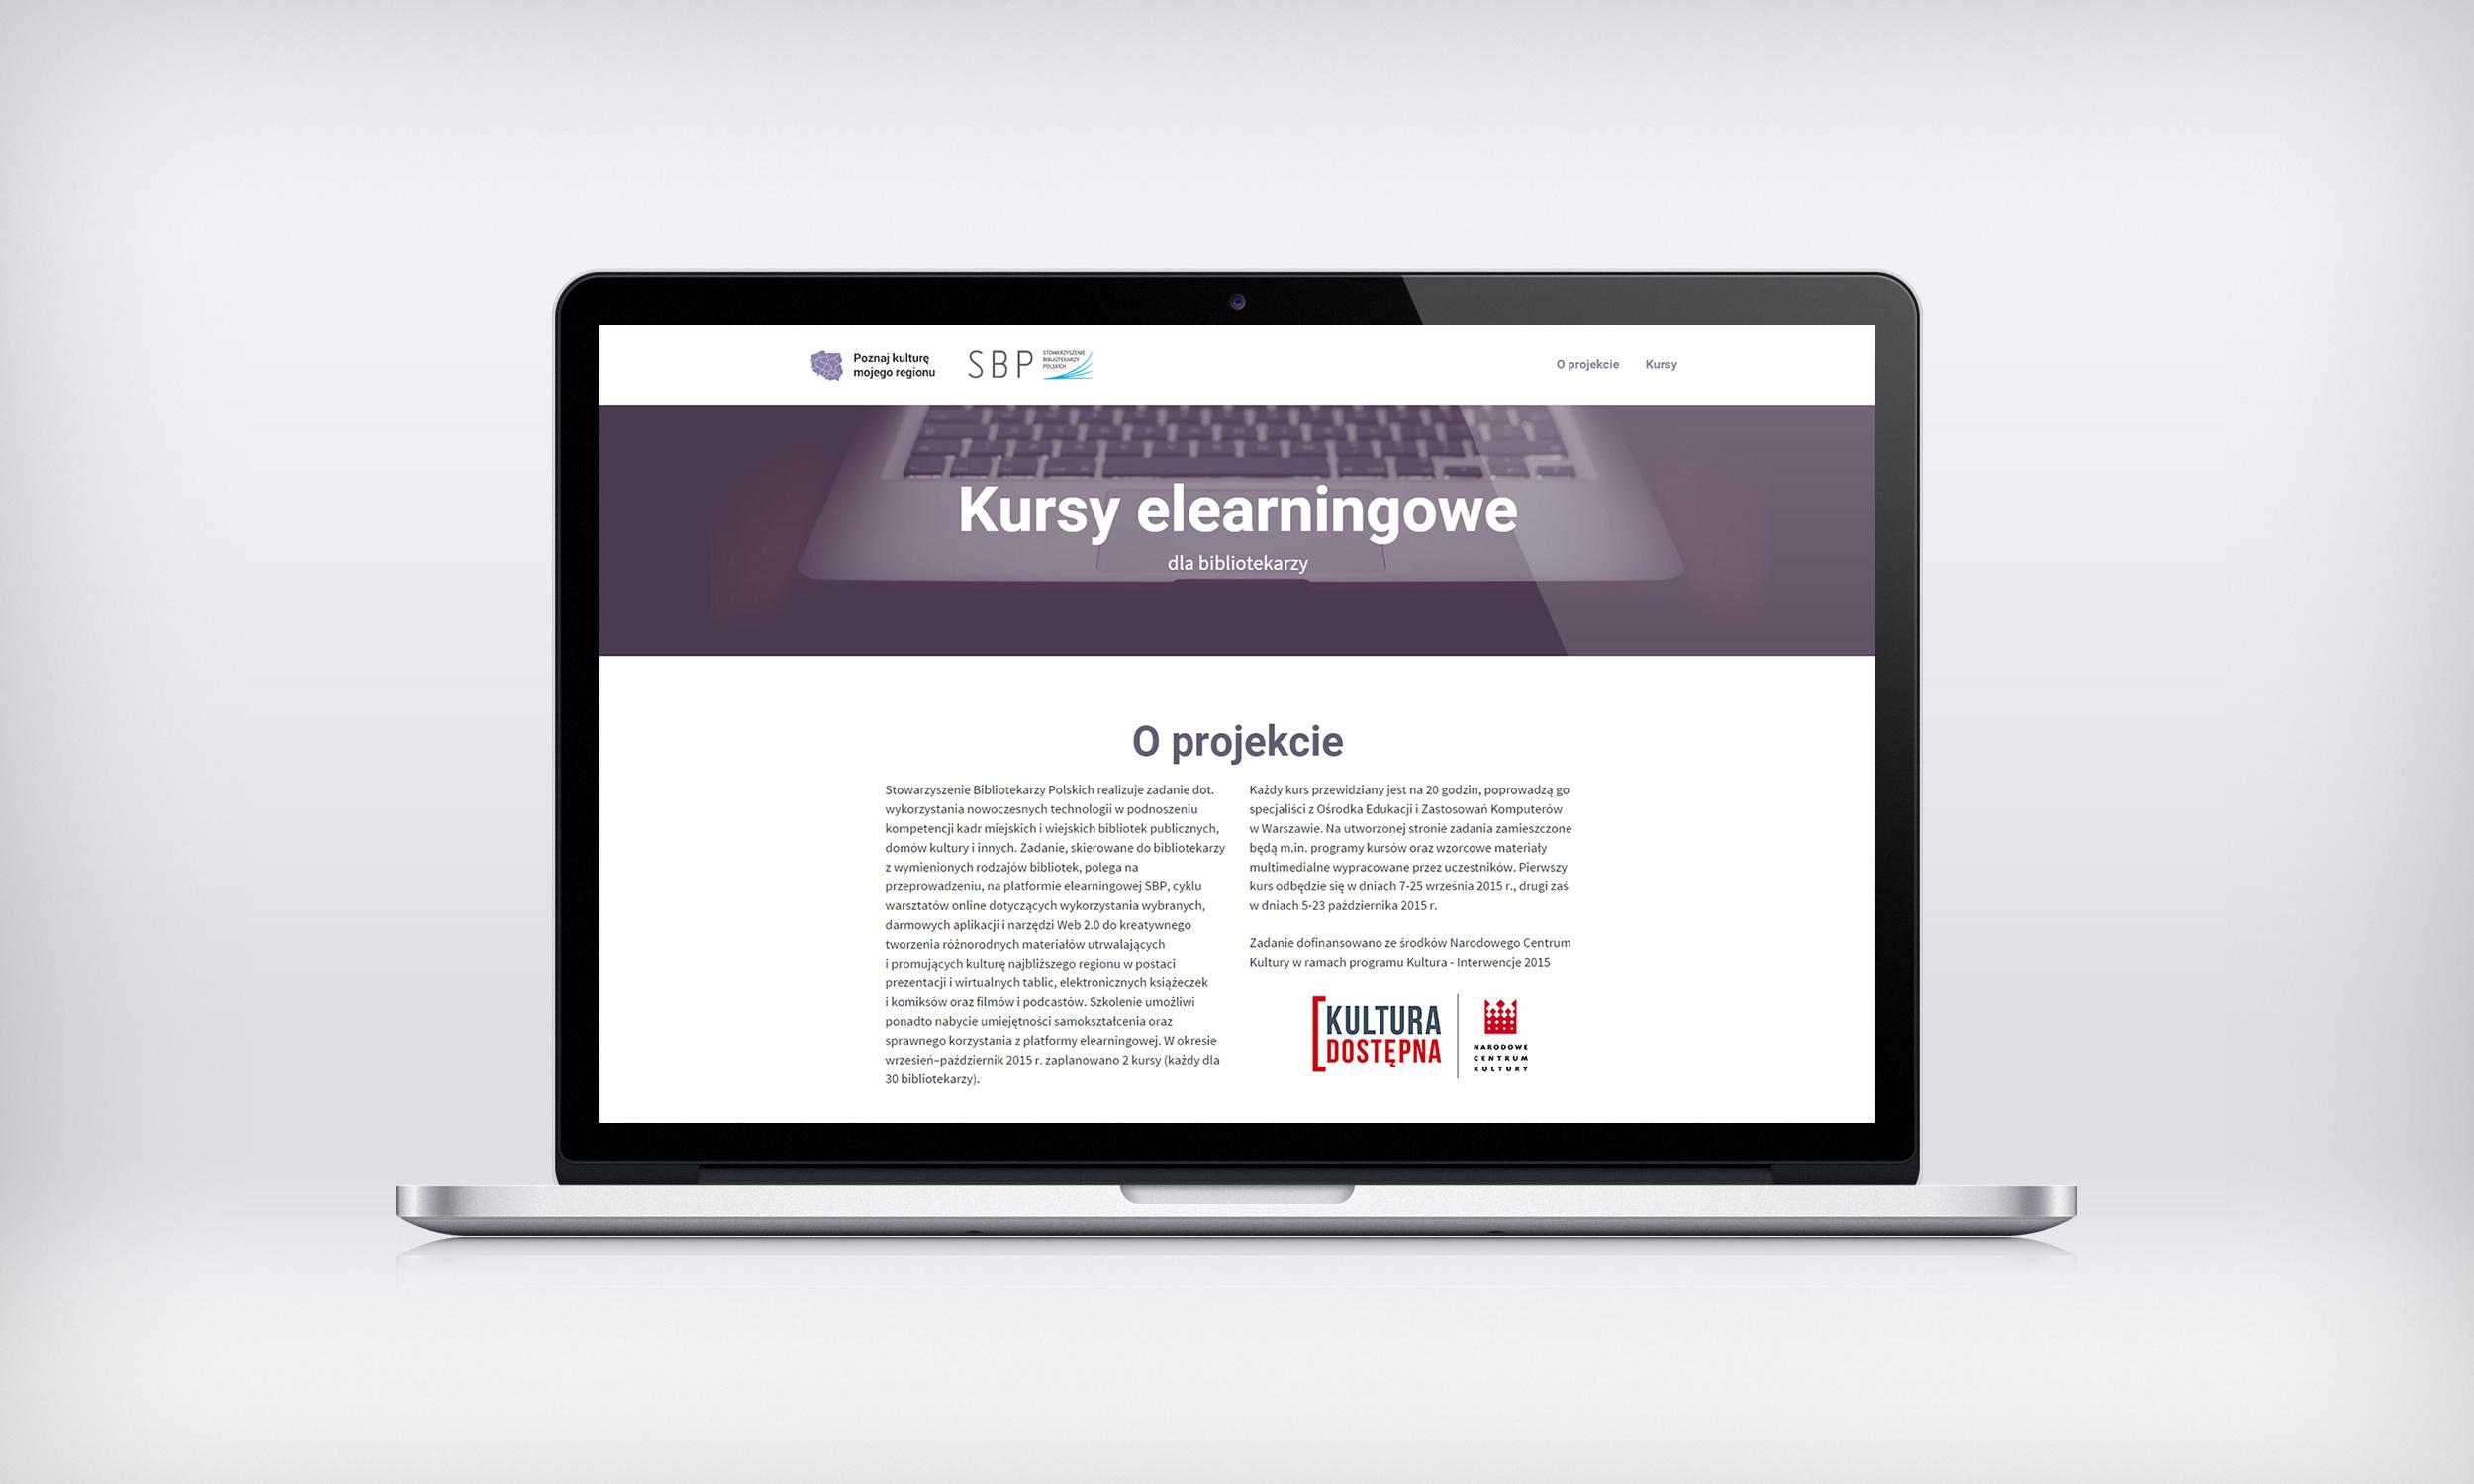 kursy-elearningow